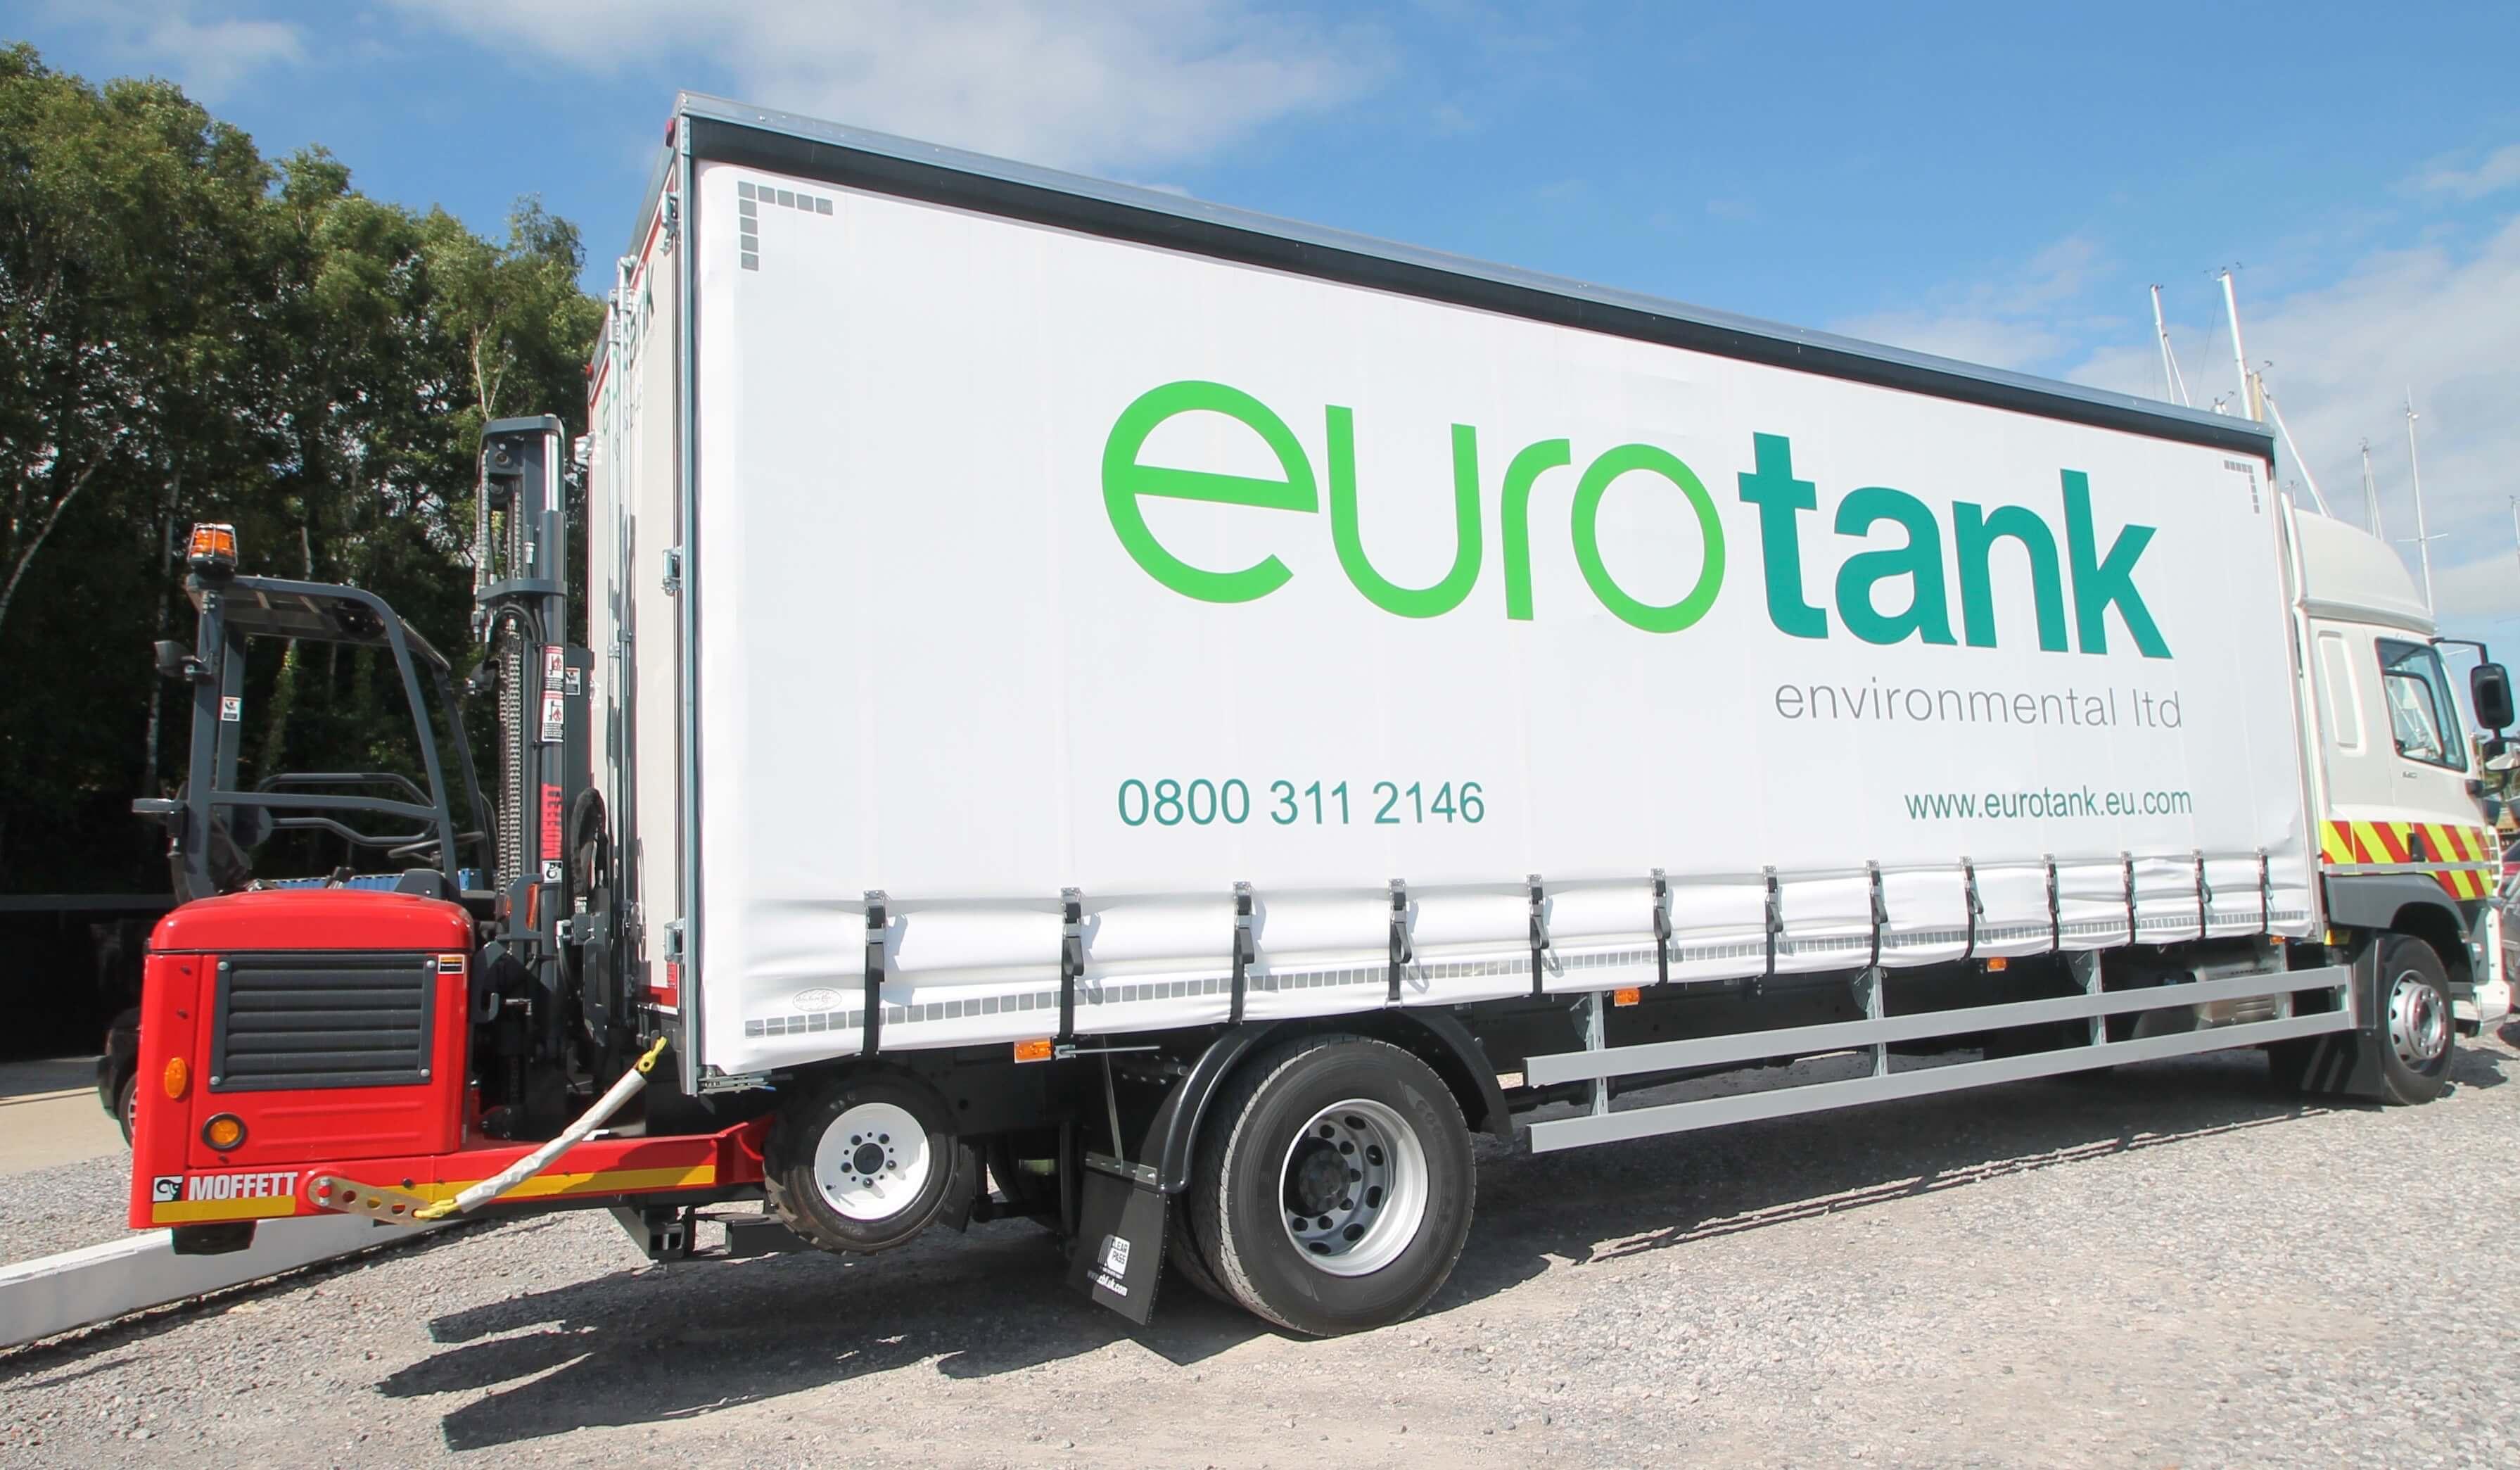 Eurotank DAF Truck